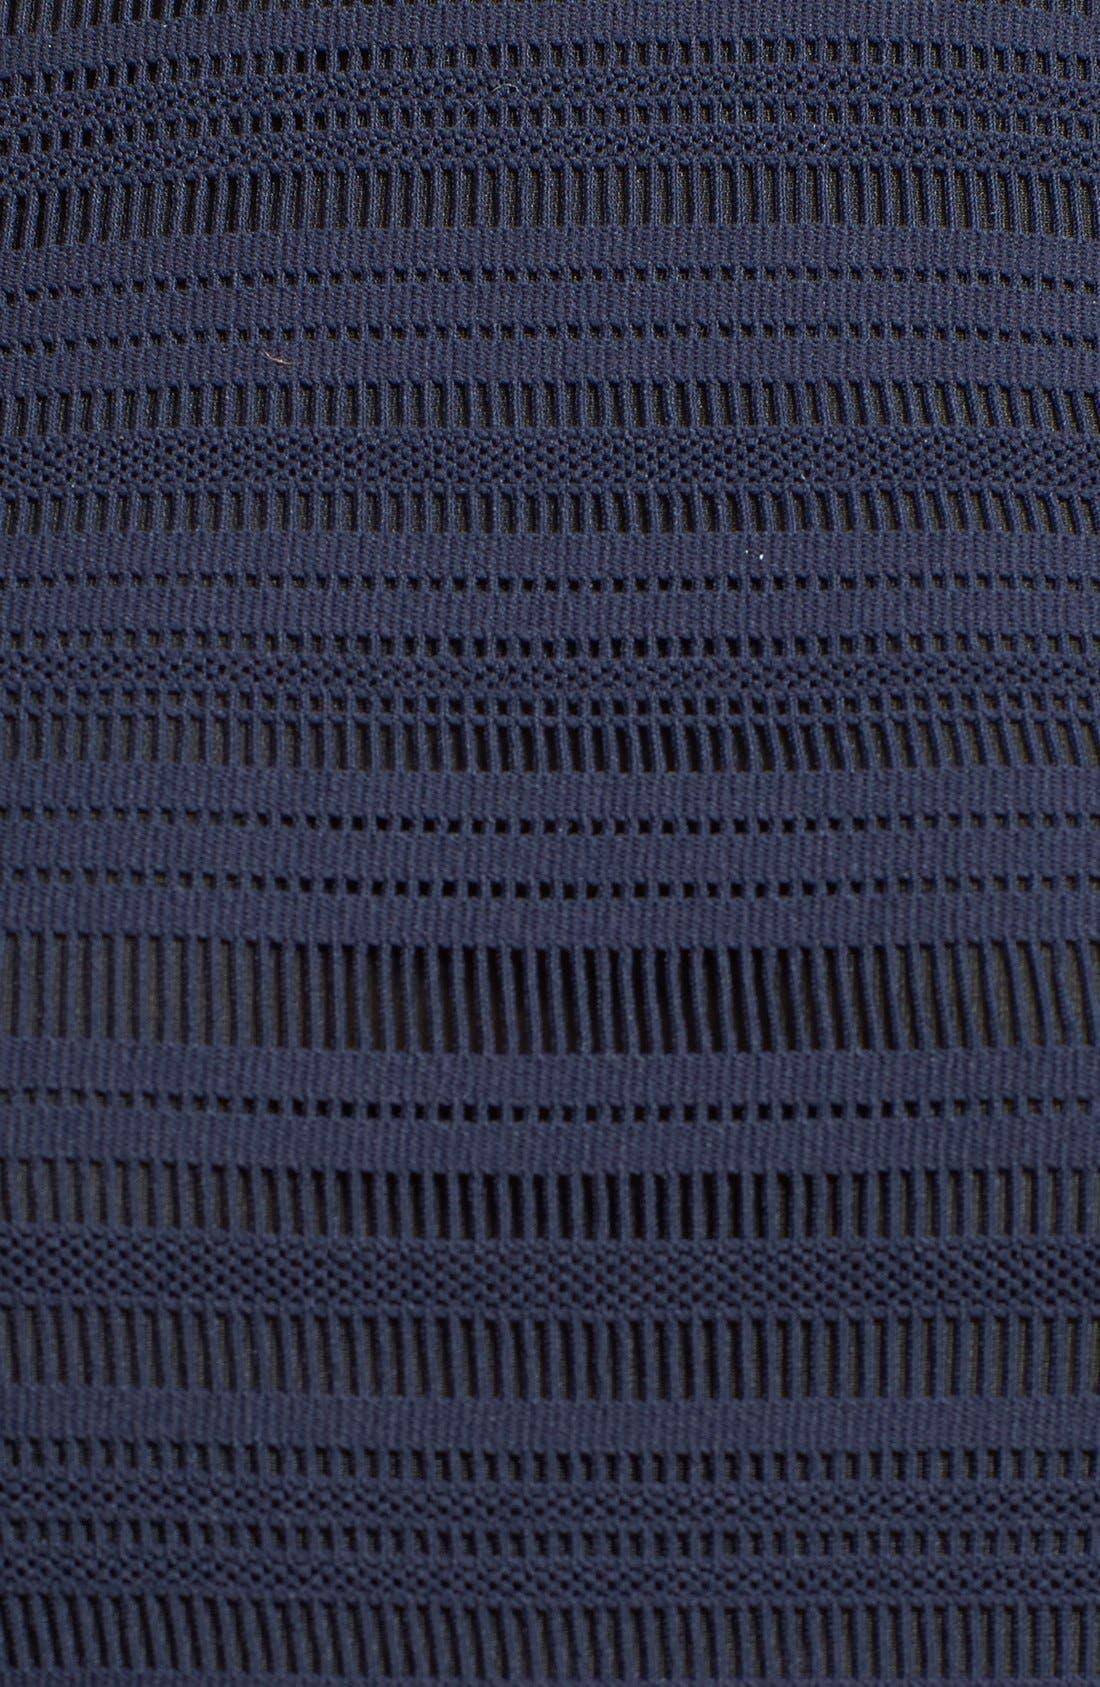 Alternate Image 3  - rag & bone 'Basha' Leather Trim Dress